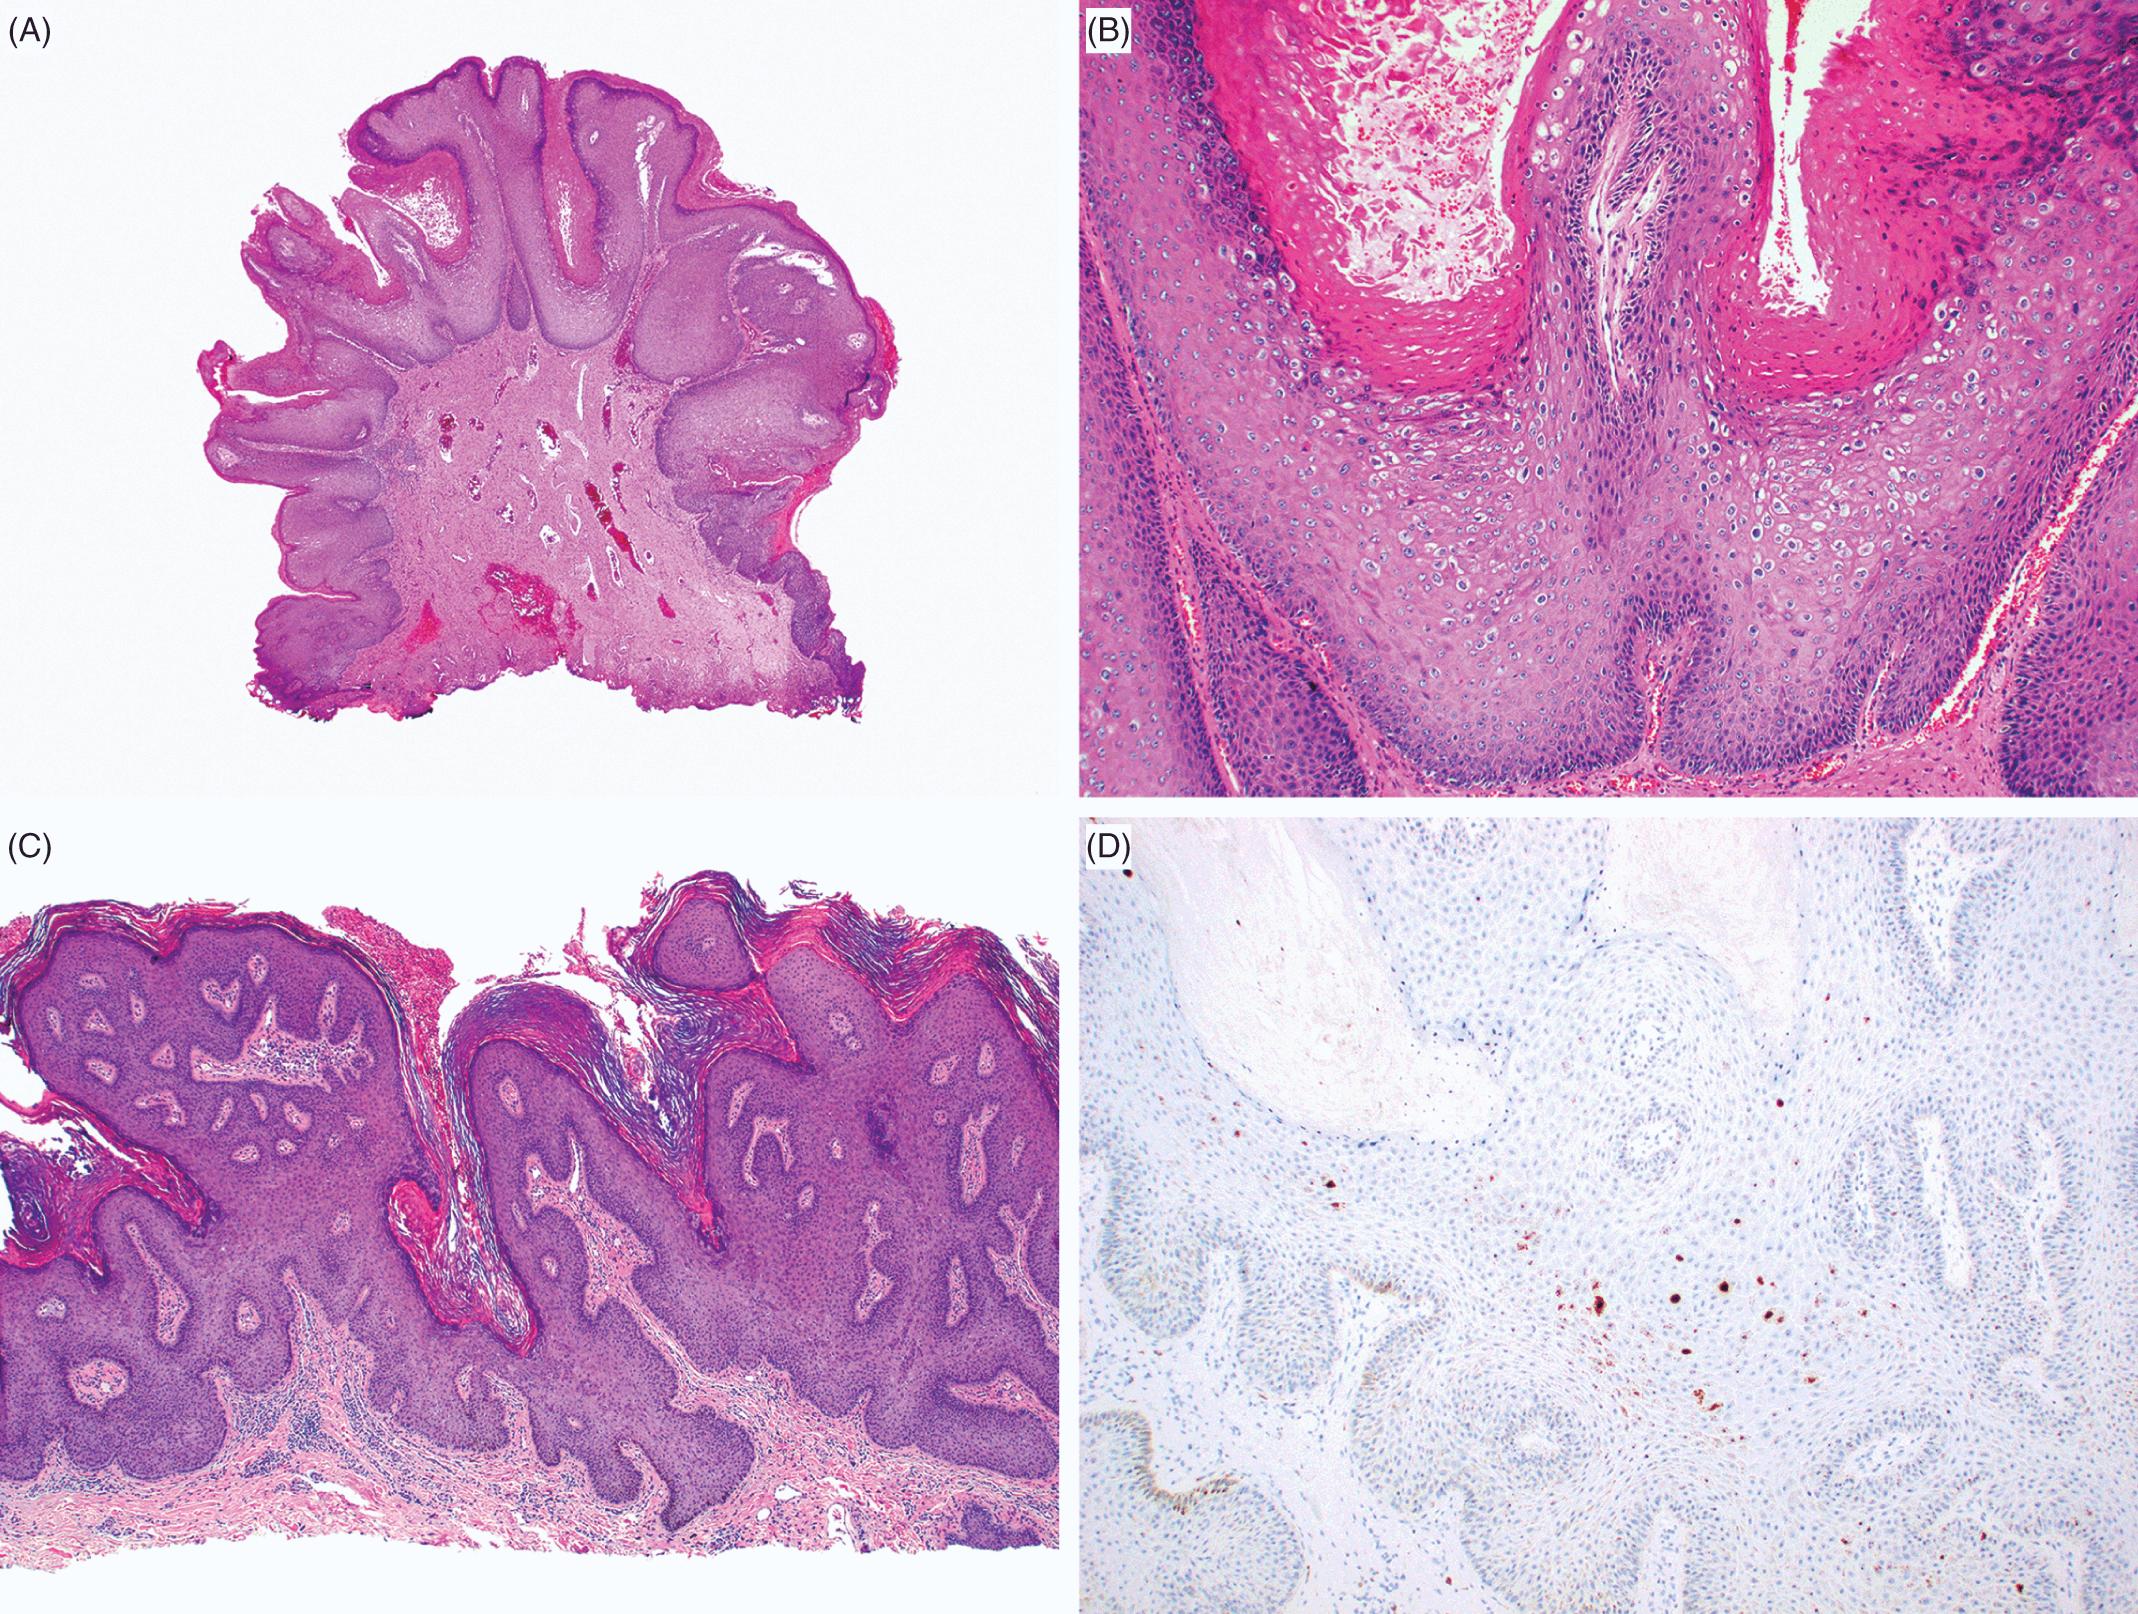 Hyperkeratosis bőr papilloma, Dr. Diag - Verrucca vulgaris